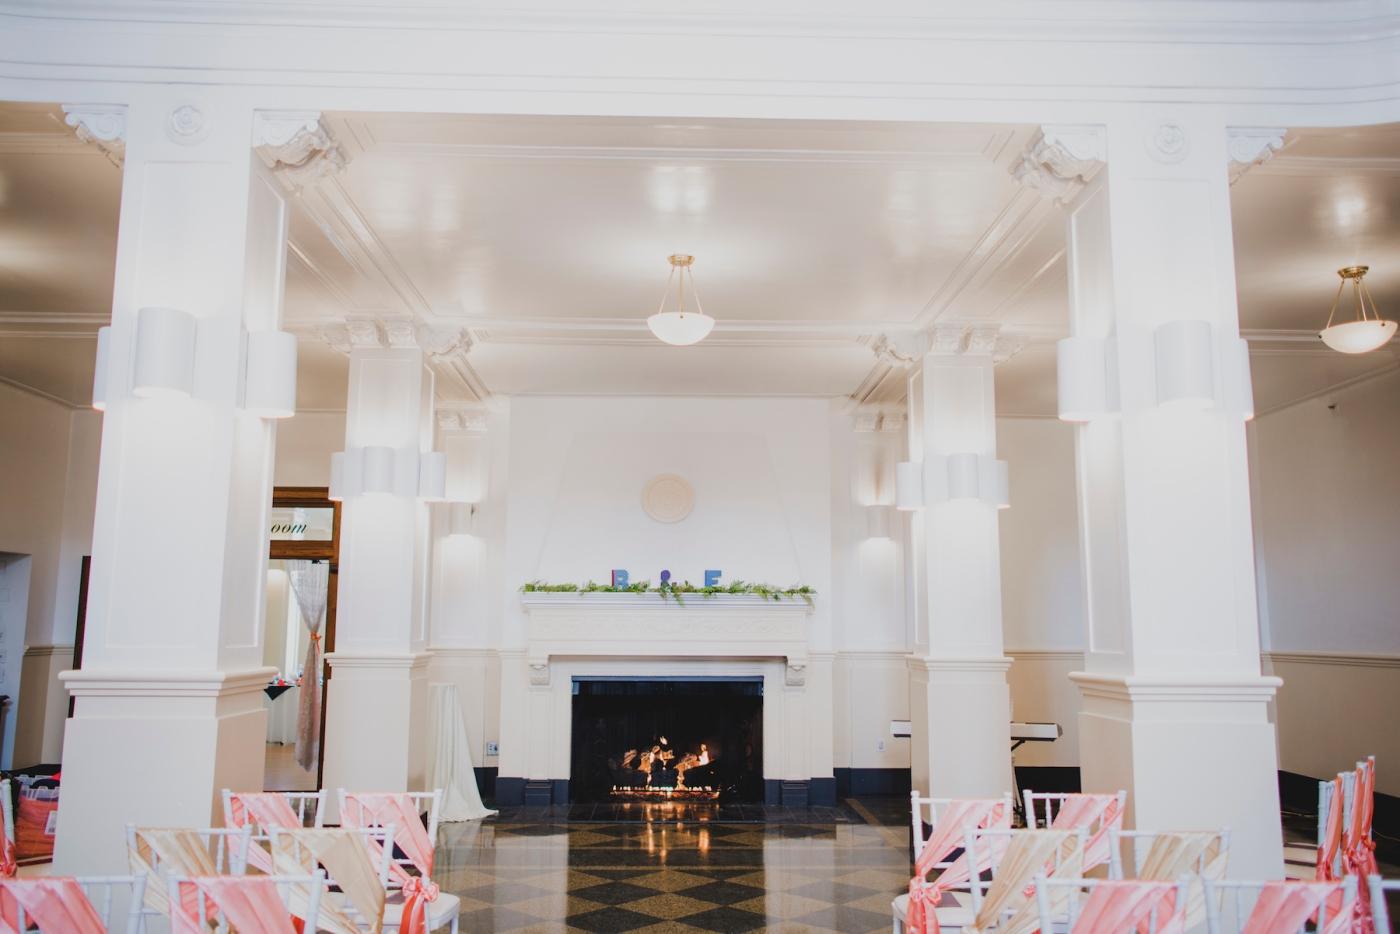 DSC_2112Everett_Wedding_Ballroom_Jane_Speleers_photography_Rachel_and_Edmund_Details_2017